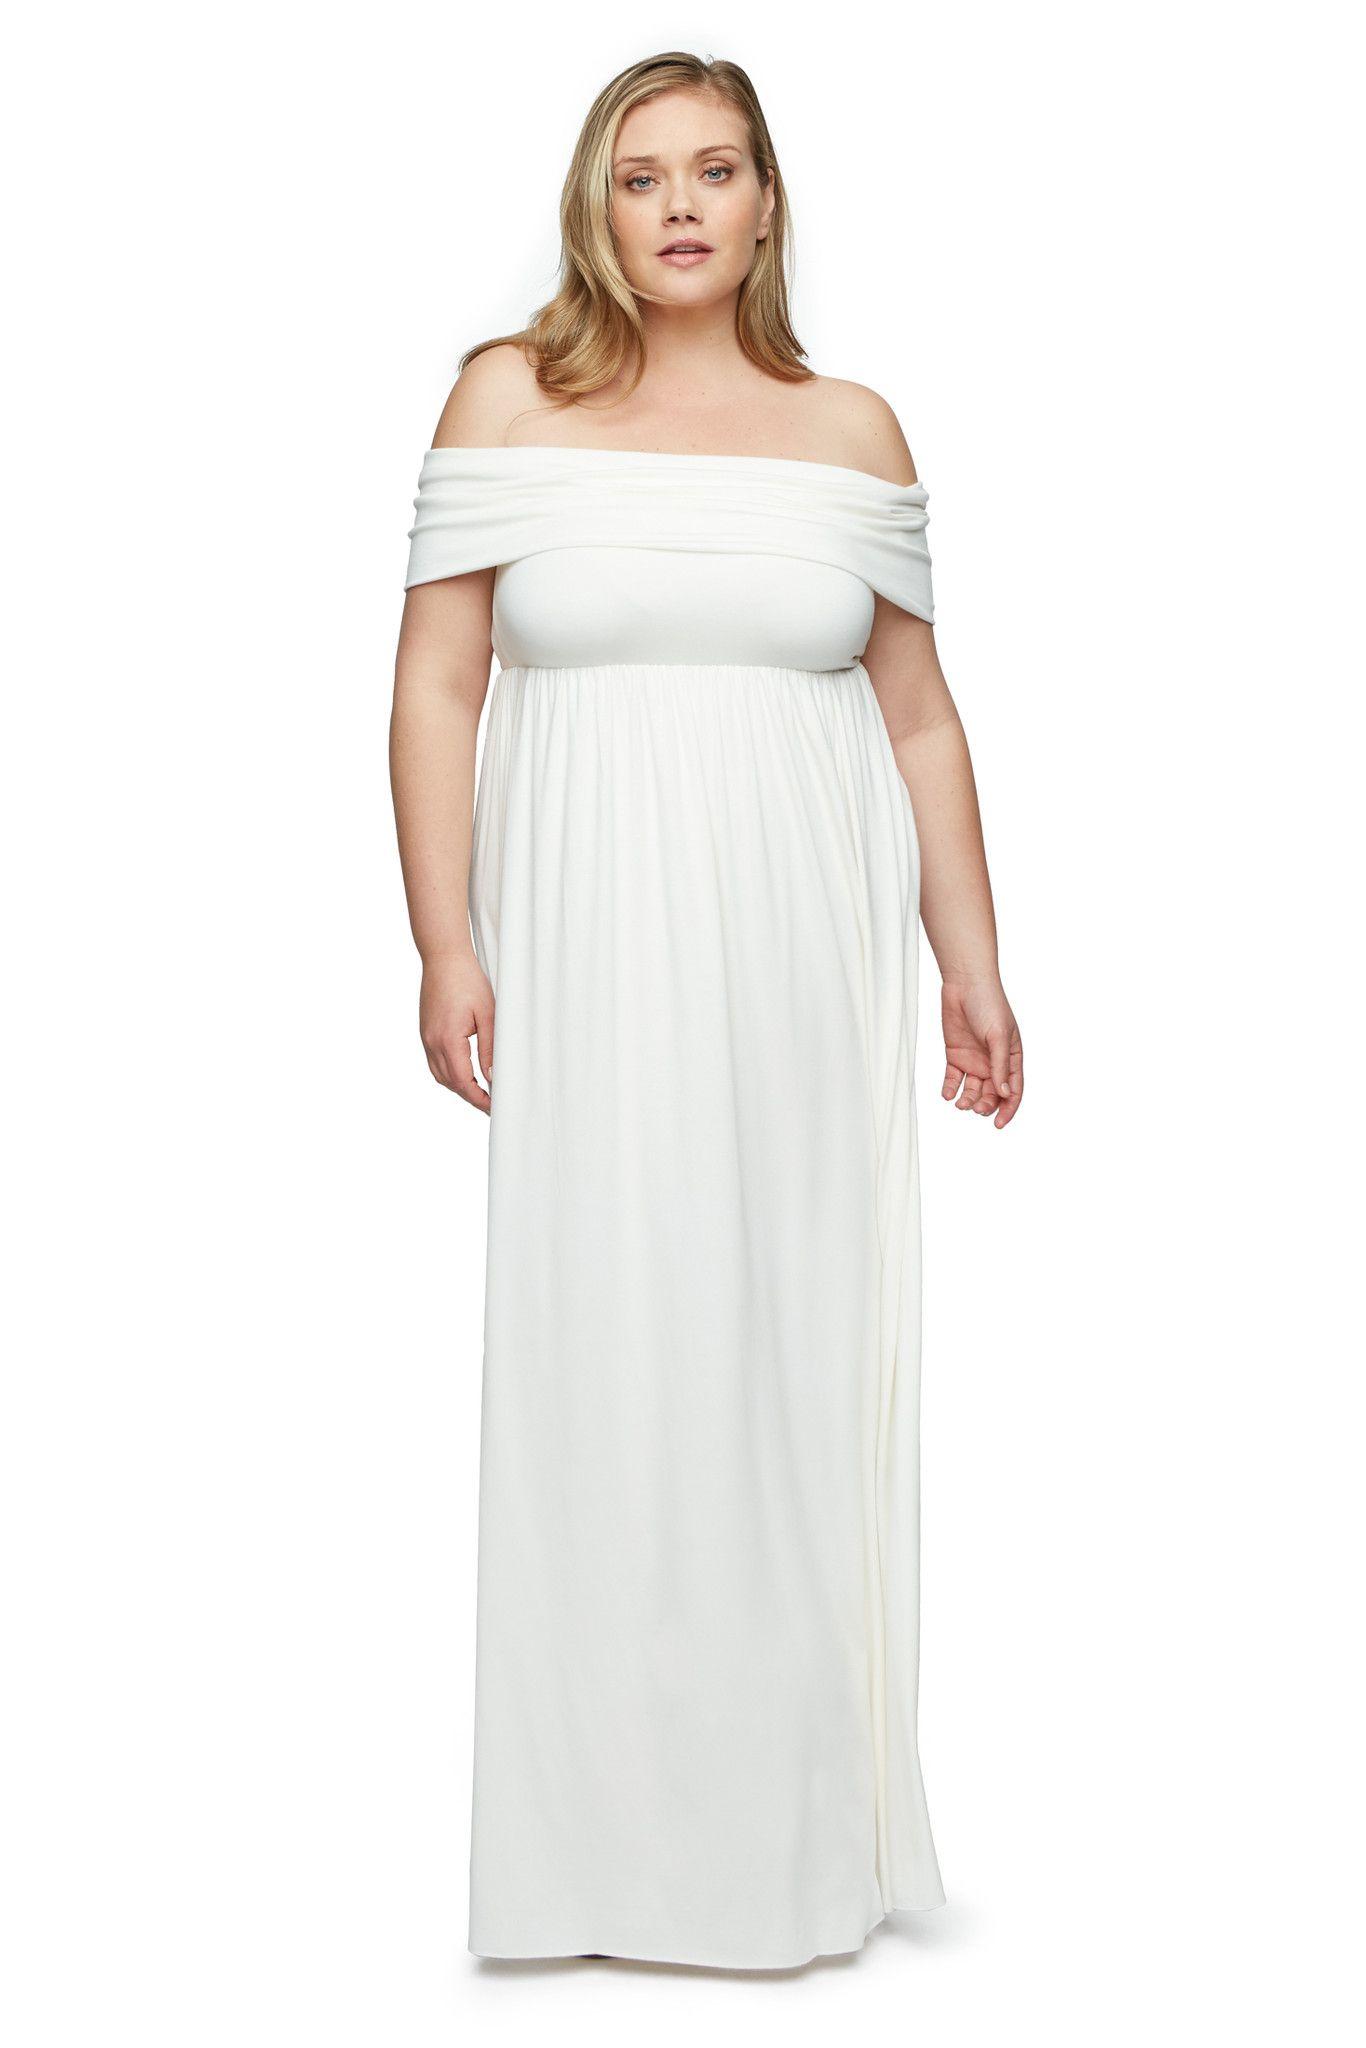 Midsummer Dress WL - White